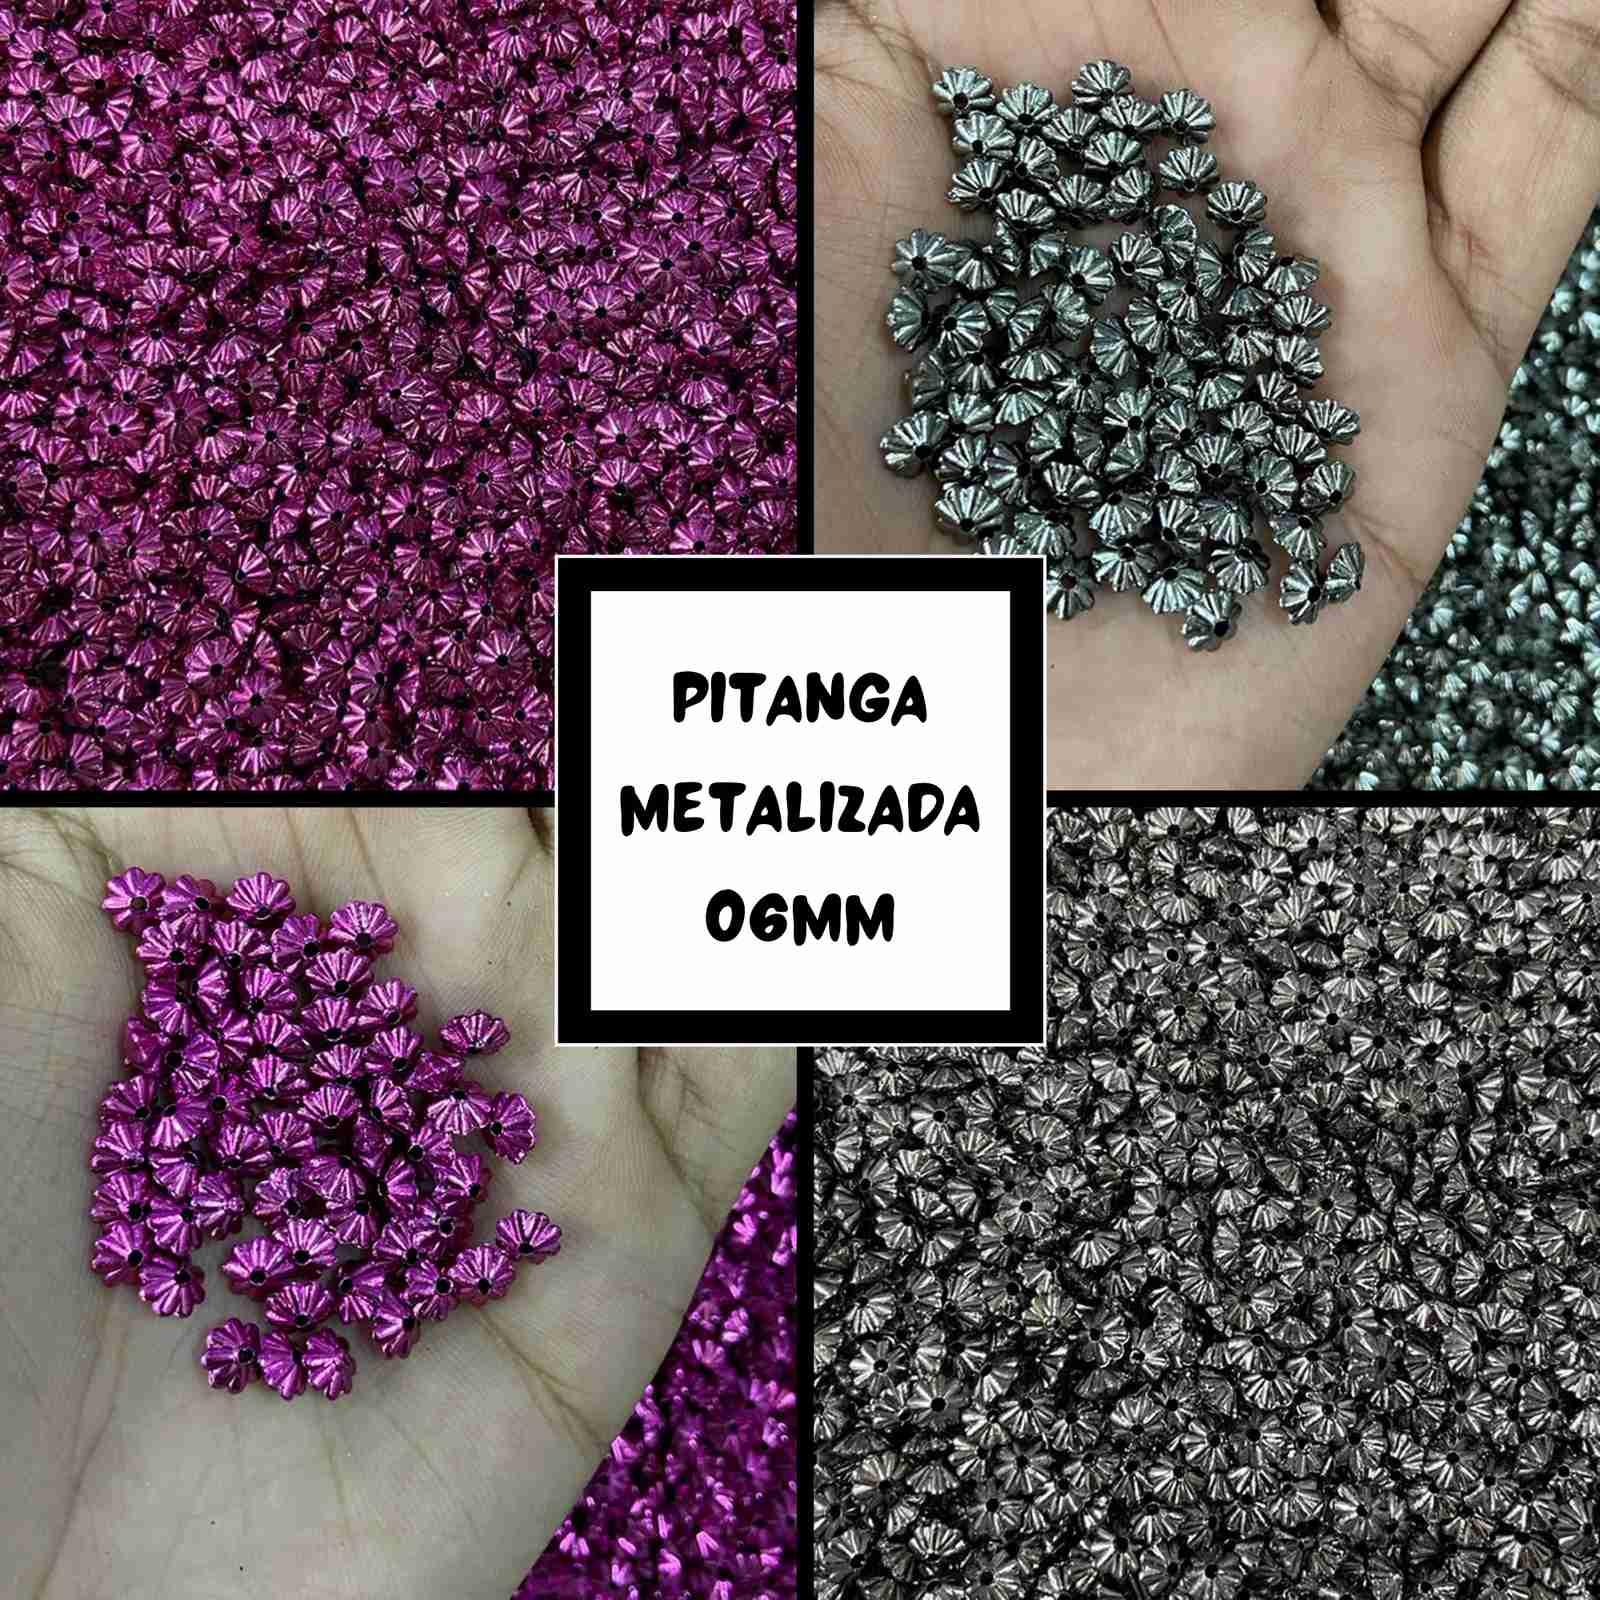 Pitanga Metalizada 06mm - 500g